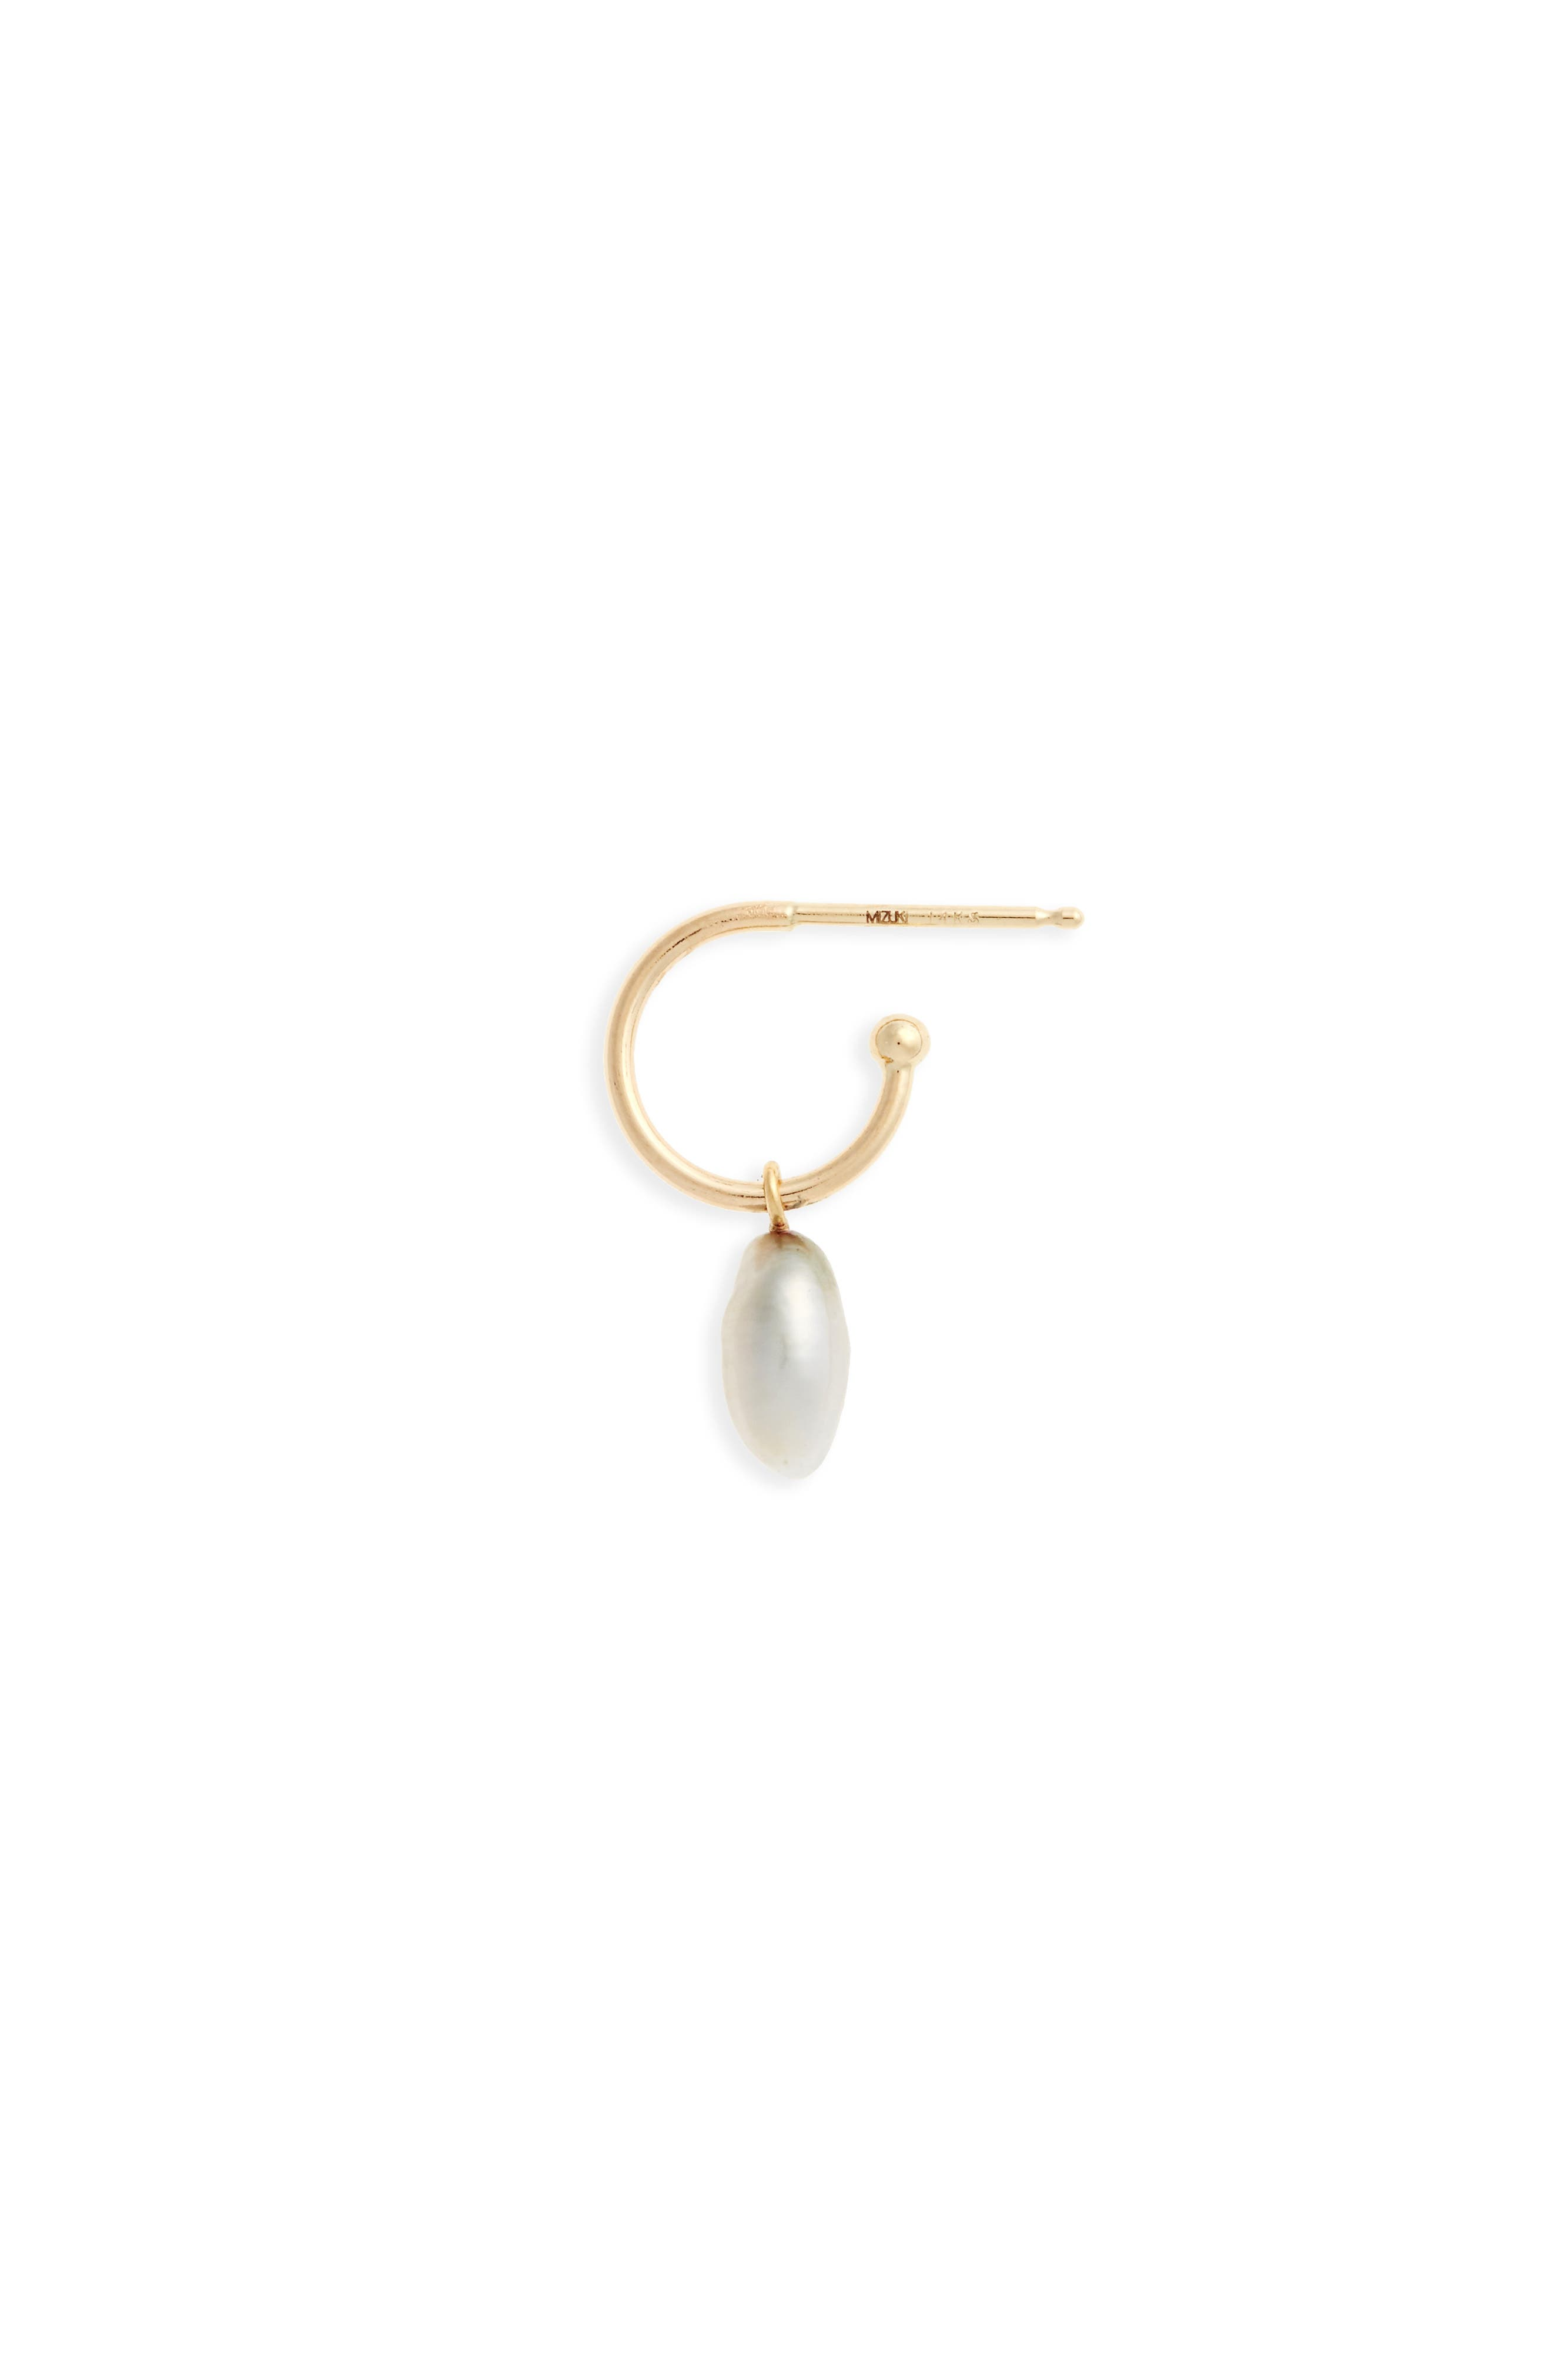 Sea of Beauty Pearl Single Hoop Earring,                             Main thumbnail 1, color,                             YELLOW GOLD/ GREY PEARL